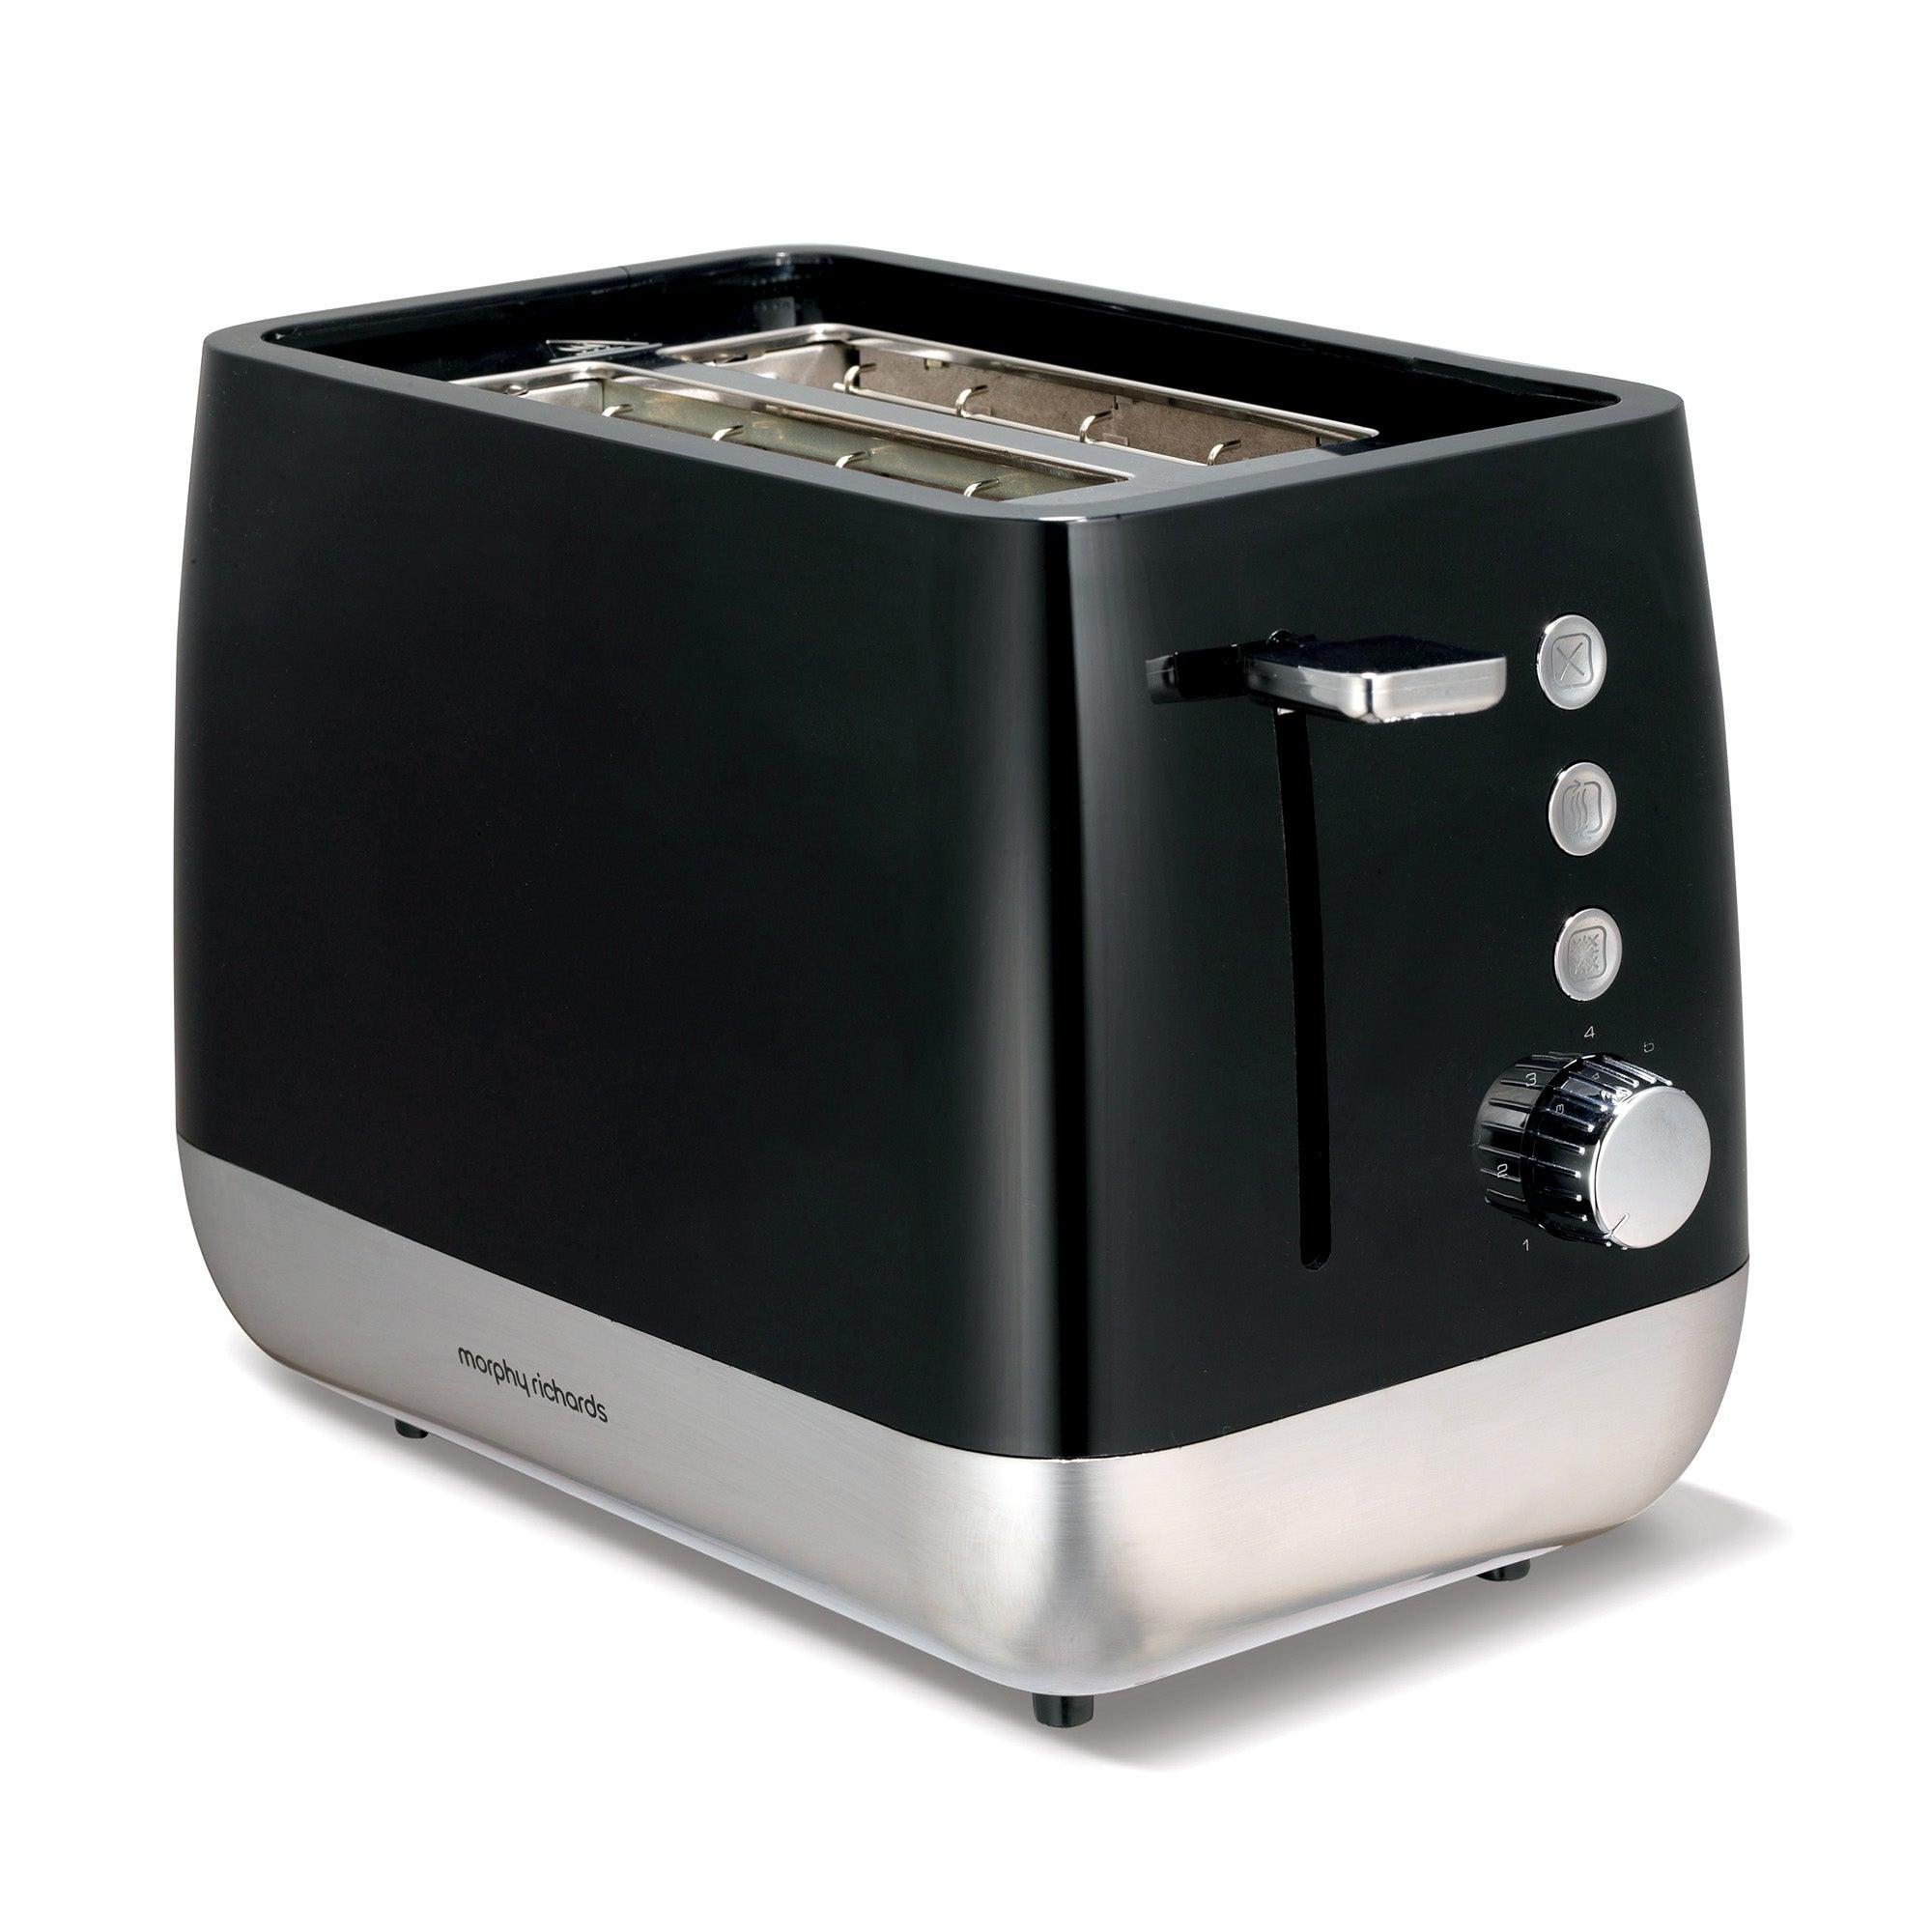 Morphy Richards Chroma Premium 221152 Black 2 Slice Toaster